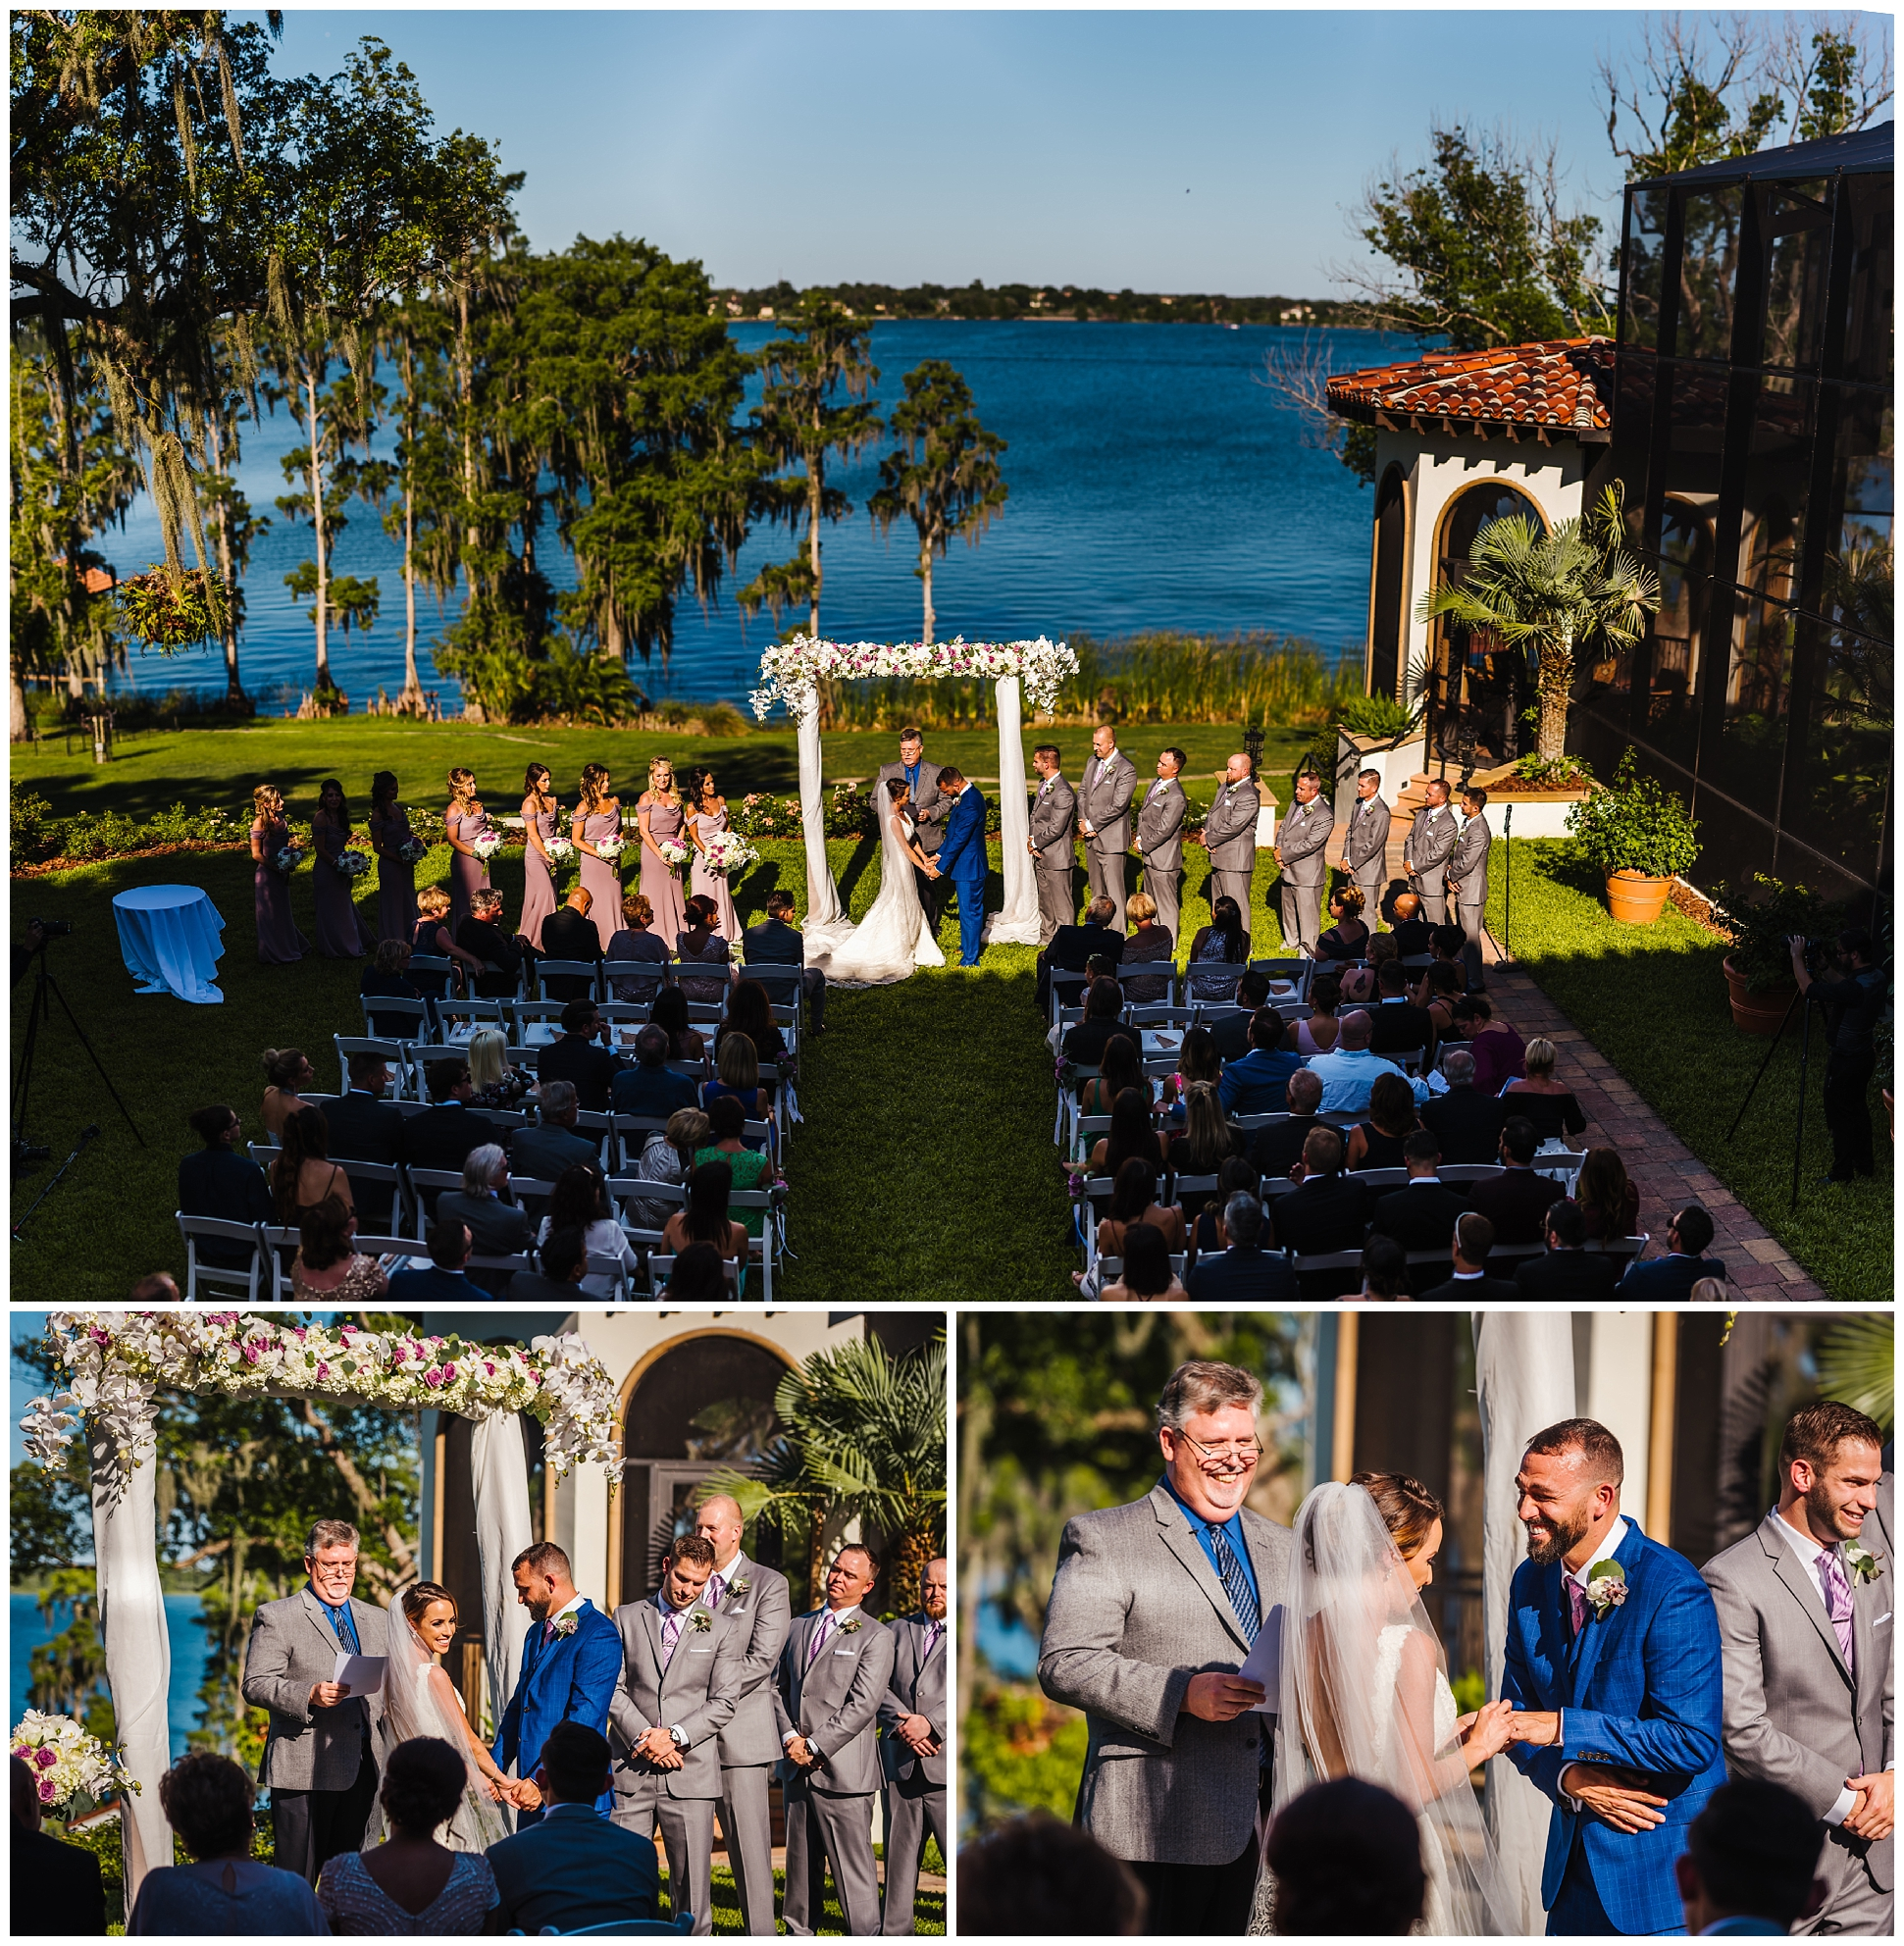 Tampa-luxury-wedding-photographer-mision-lago-private-estate_0029.jpg